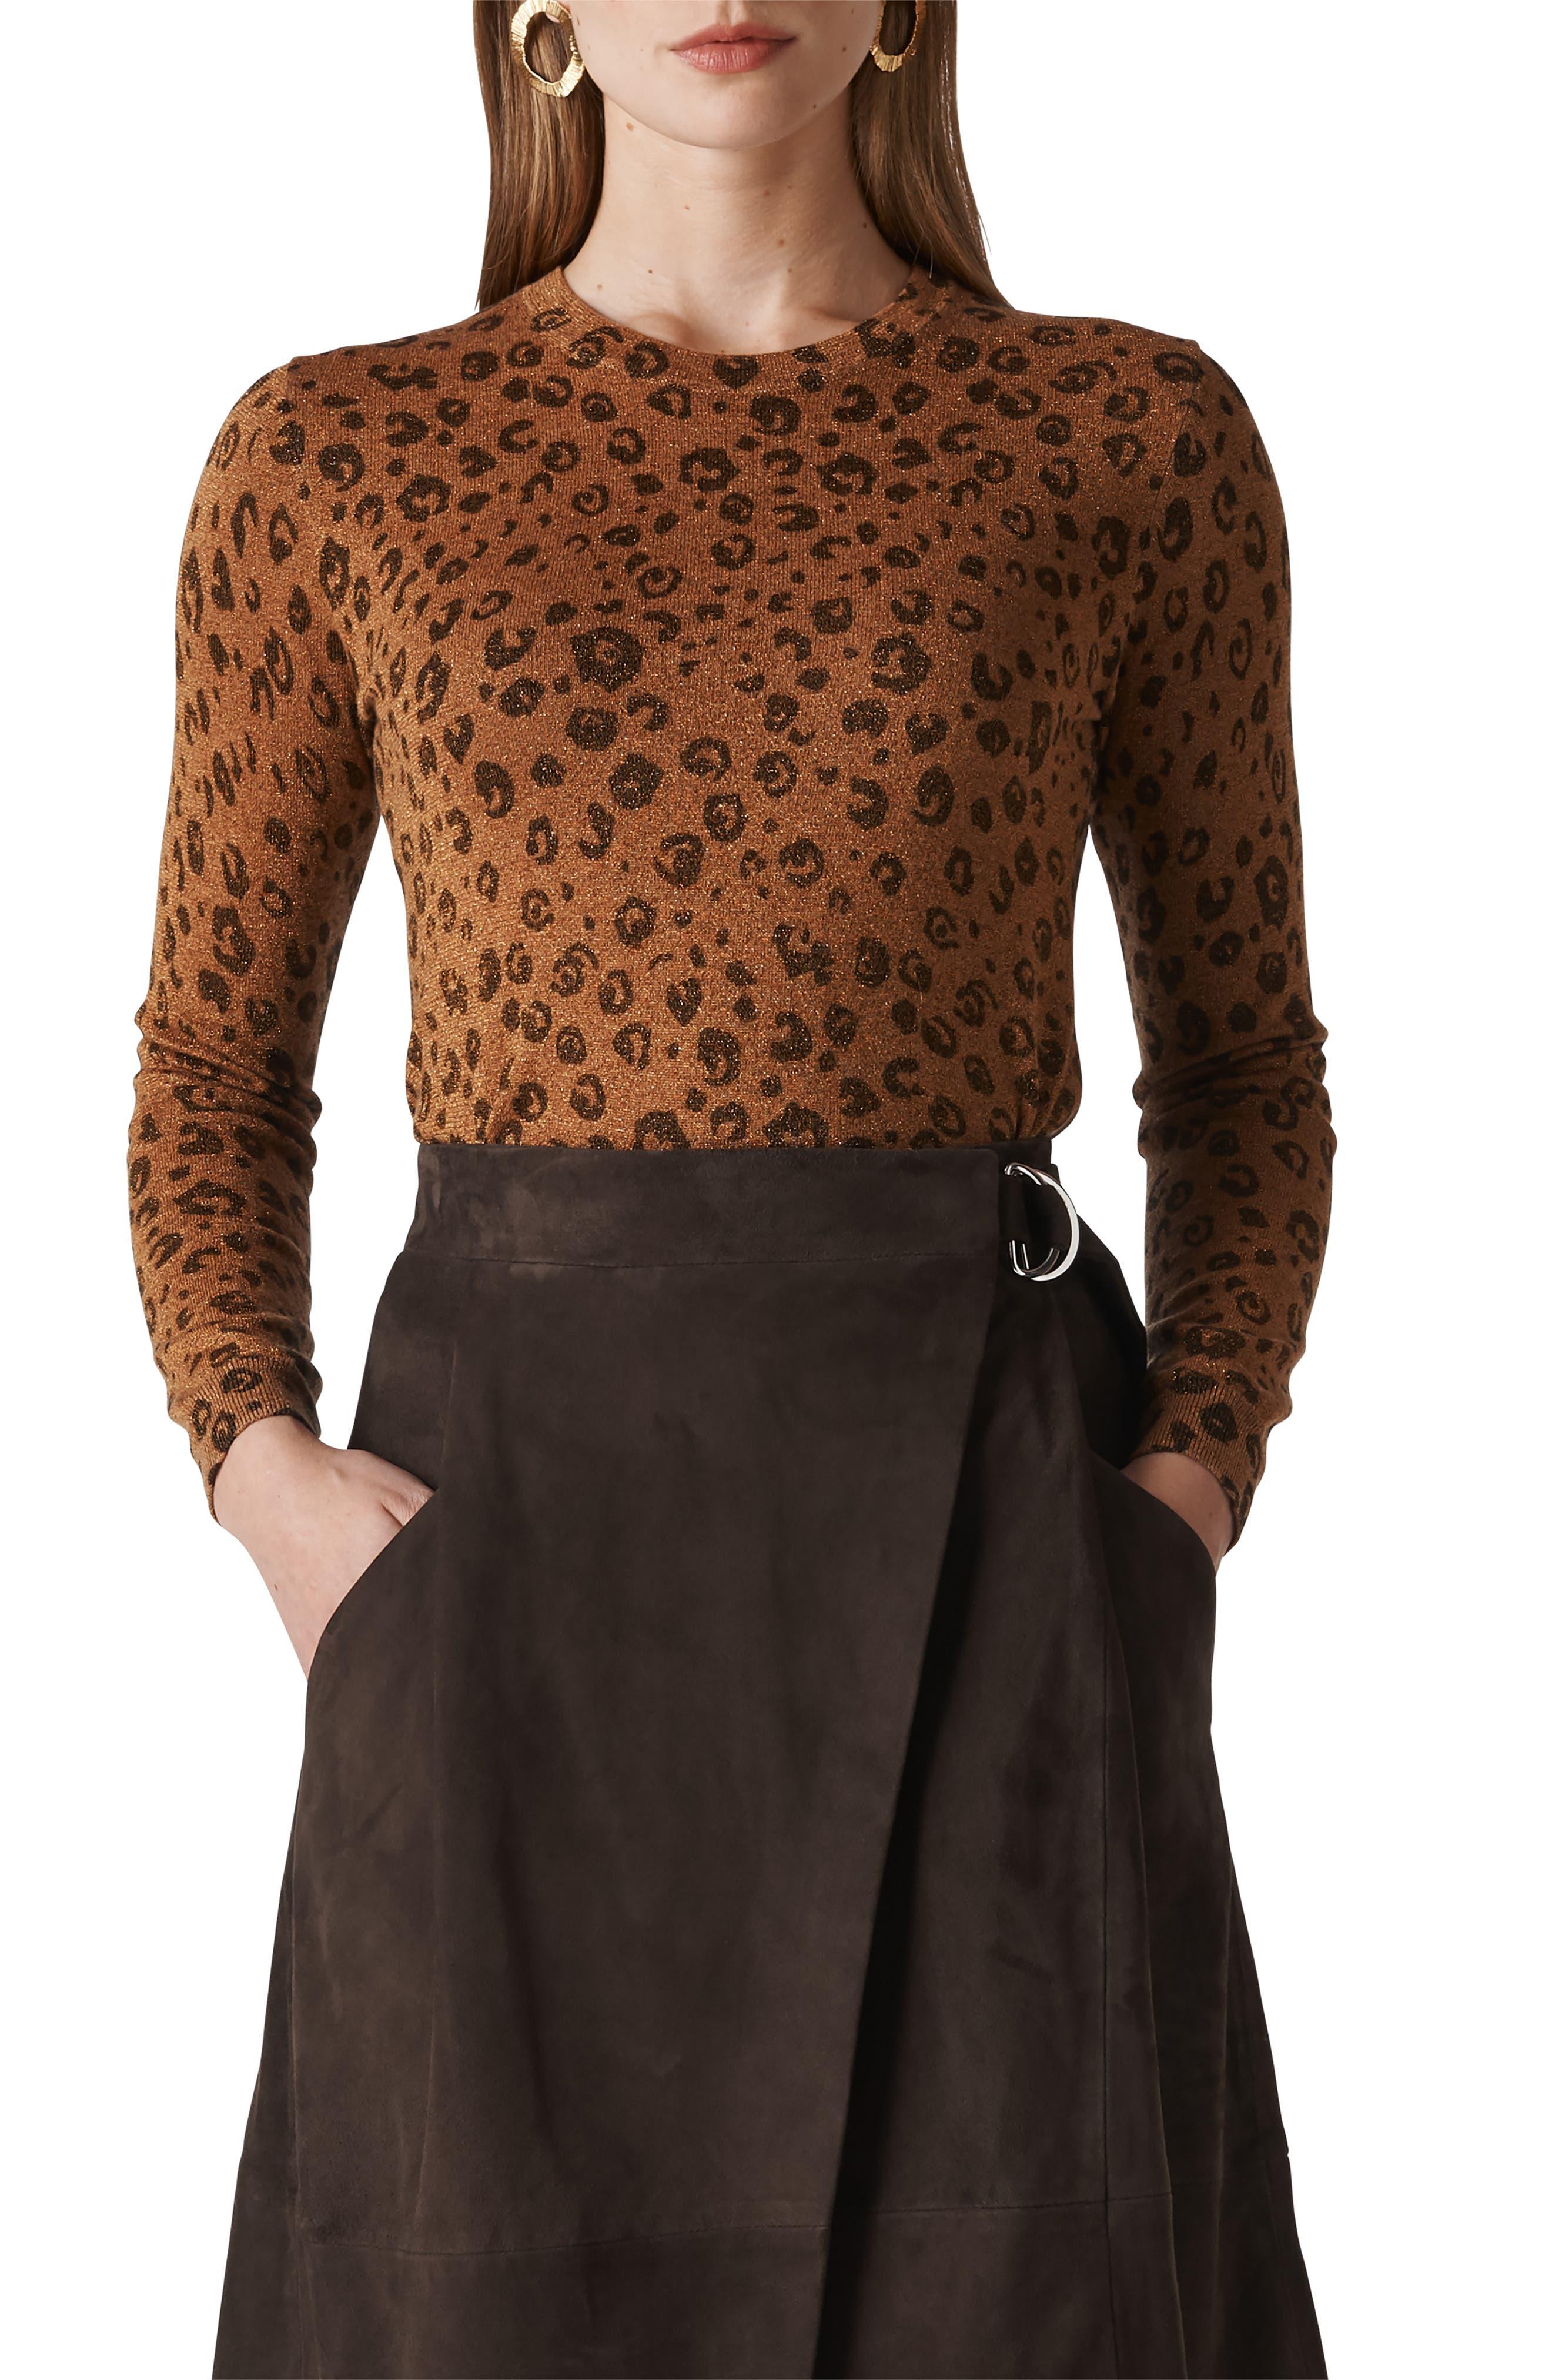 Cheetah Sparkle Sweater,                         Main,                         color, MULTICOLOUR